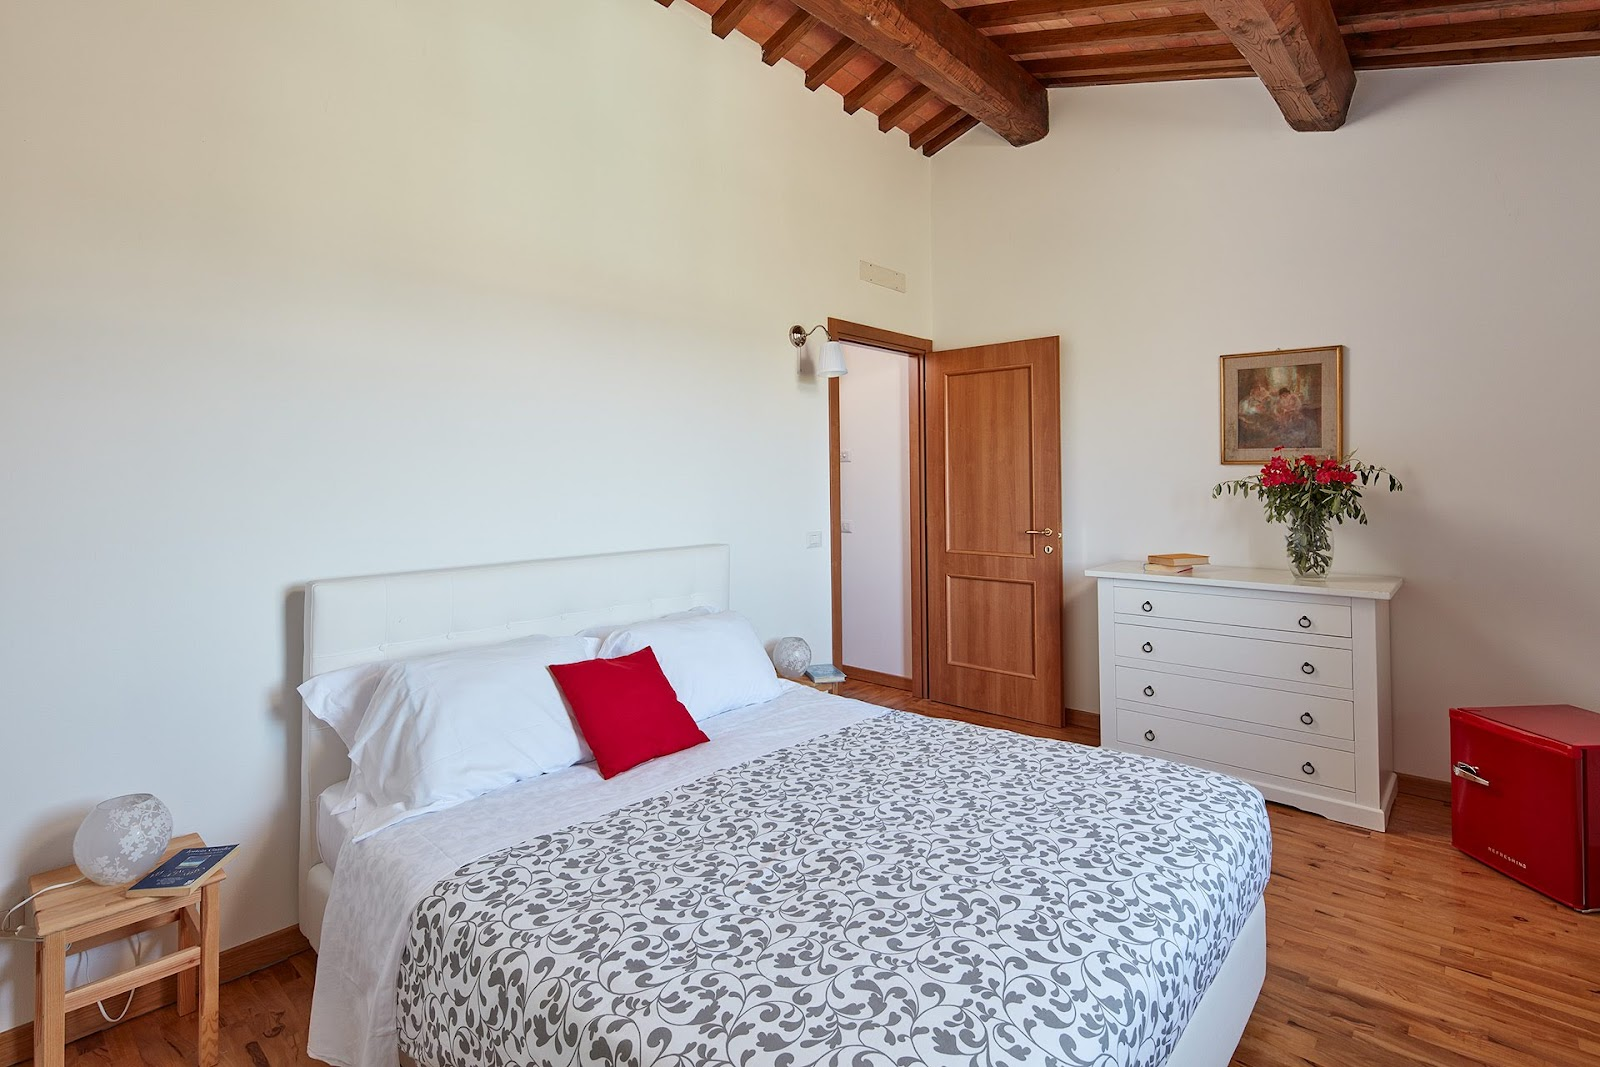 Ferienhaus Corte Paradiso (2570342), Monsummano Terme, Pistoia, Toskana, Italien, Bild 25